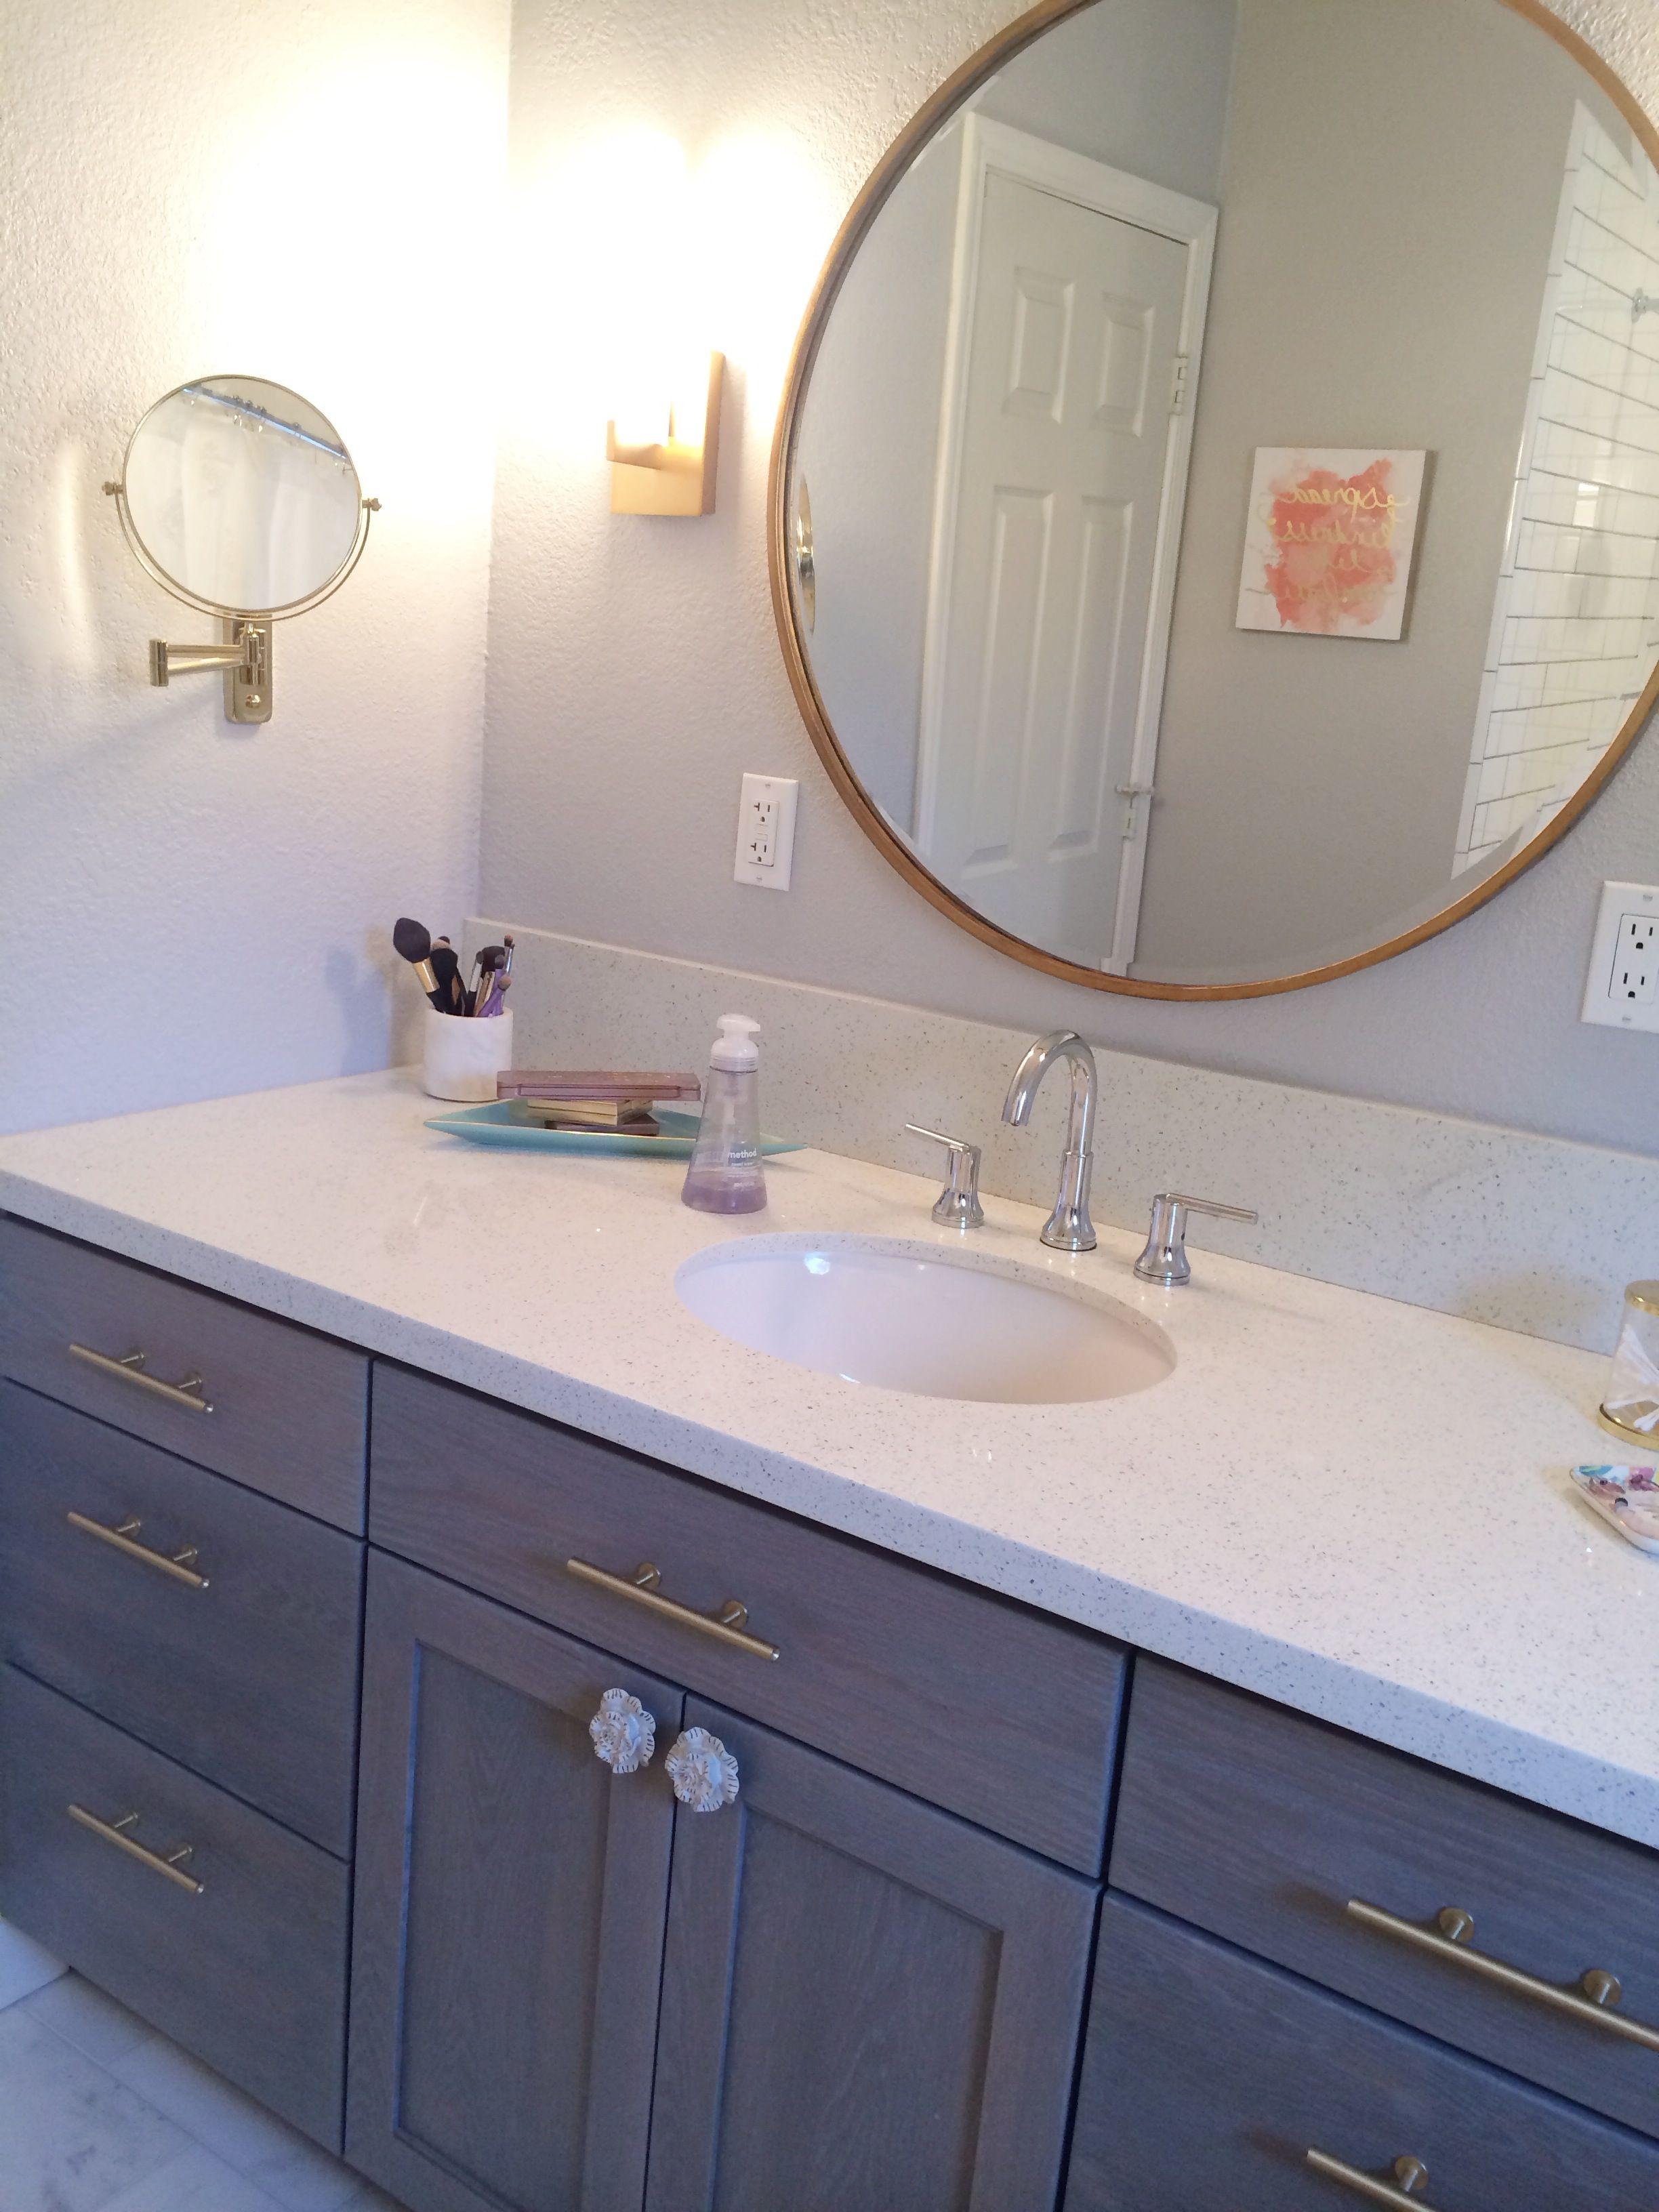 Bathroom Remodel Design Tool | Teen Bathroom Remodel Design By Karina Minteer Bunches And Bits